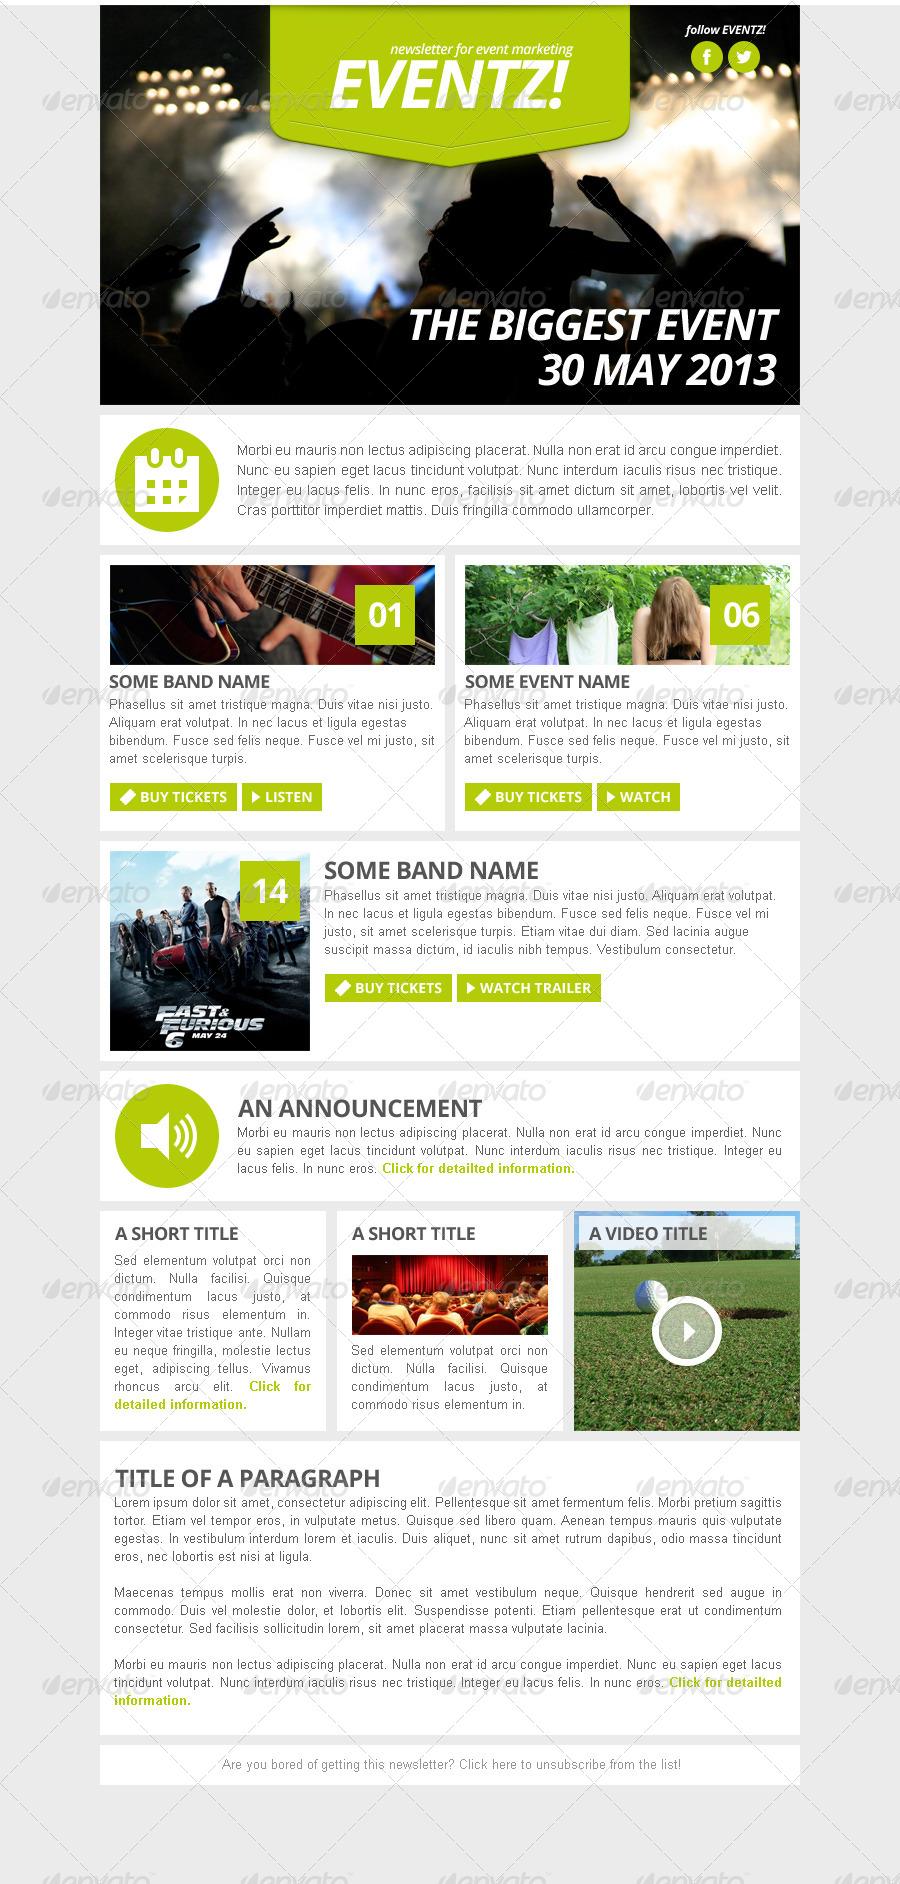 eventz event marketing newsletter template by vizivig. Black Bedroom Furniture Sets. Home Design Ideas